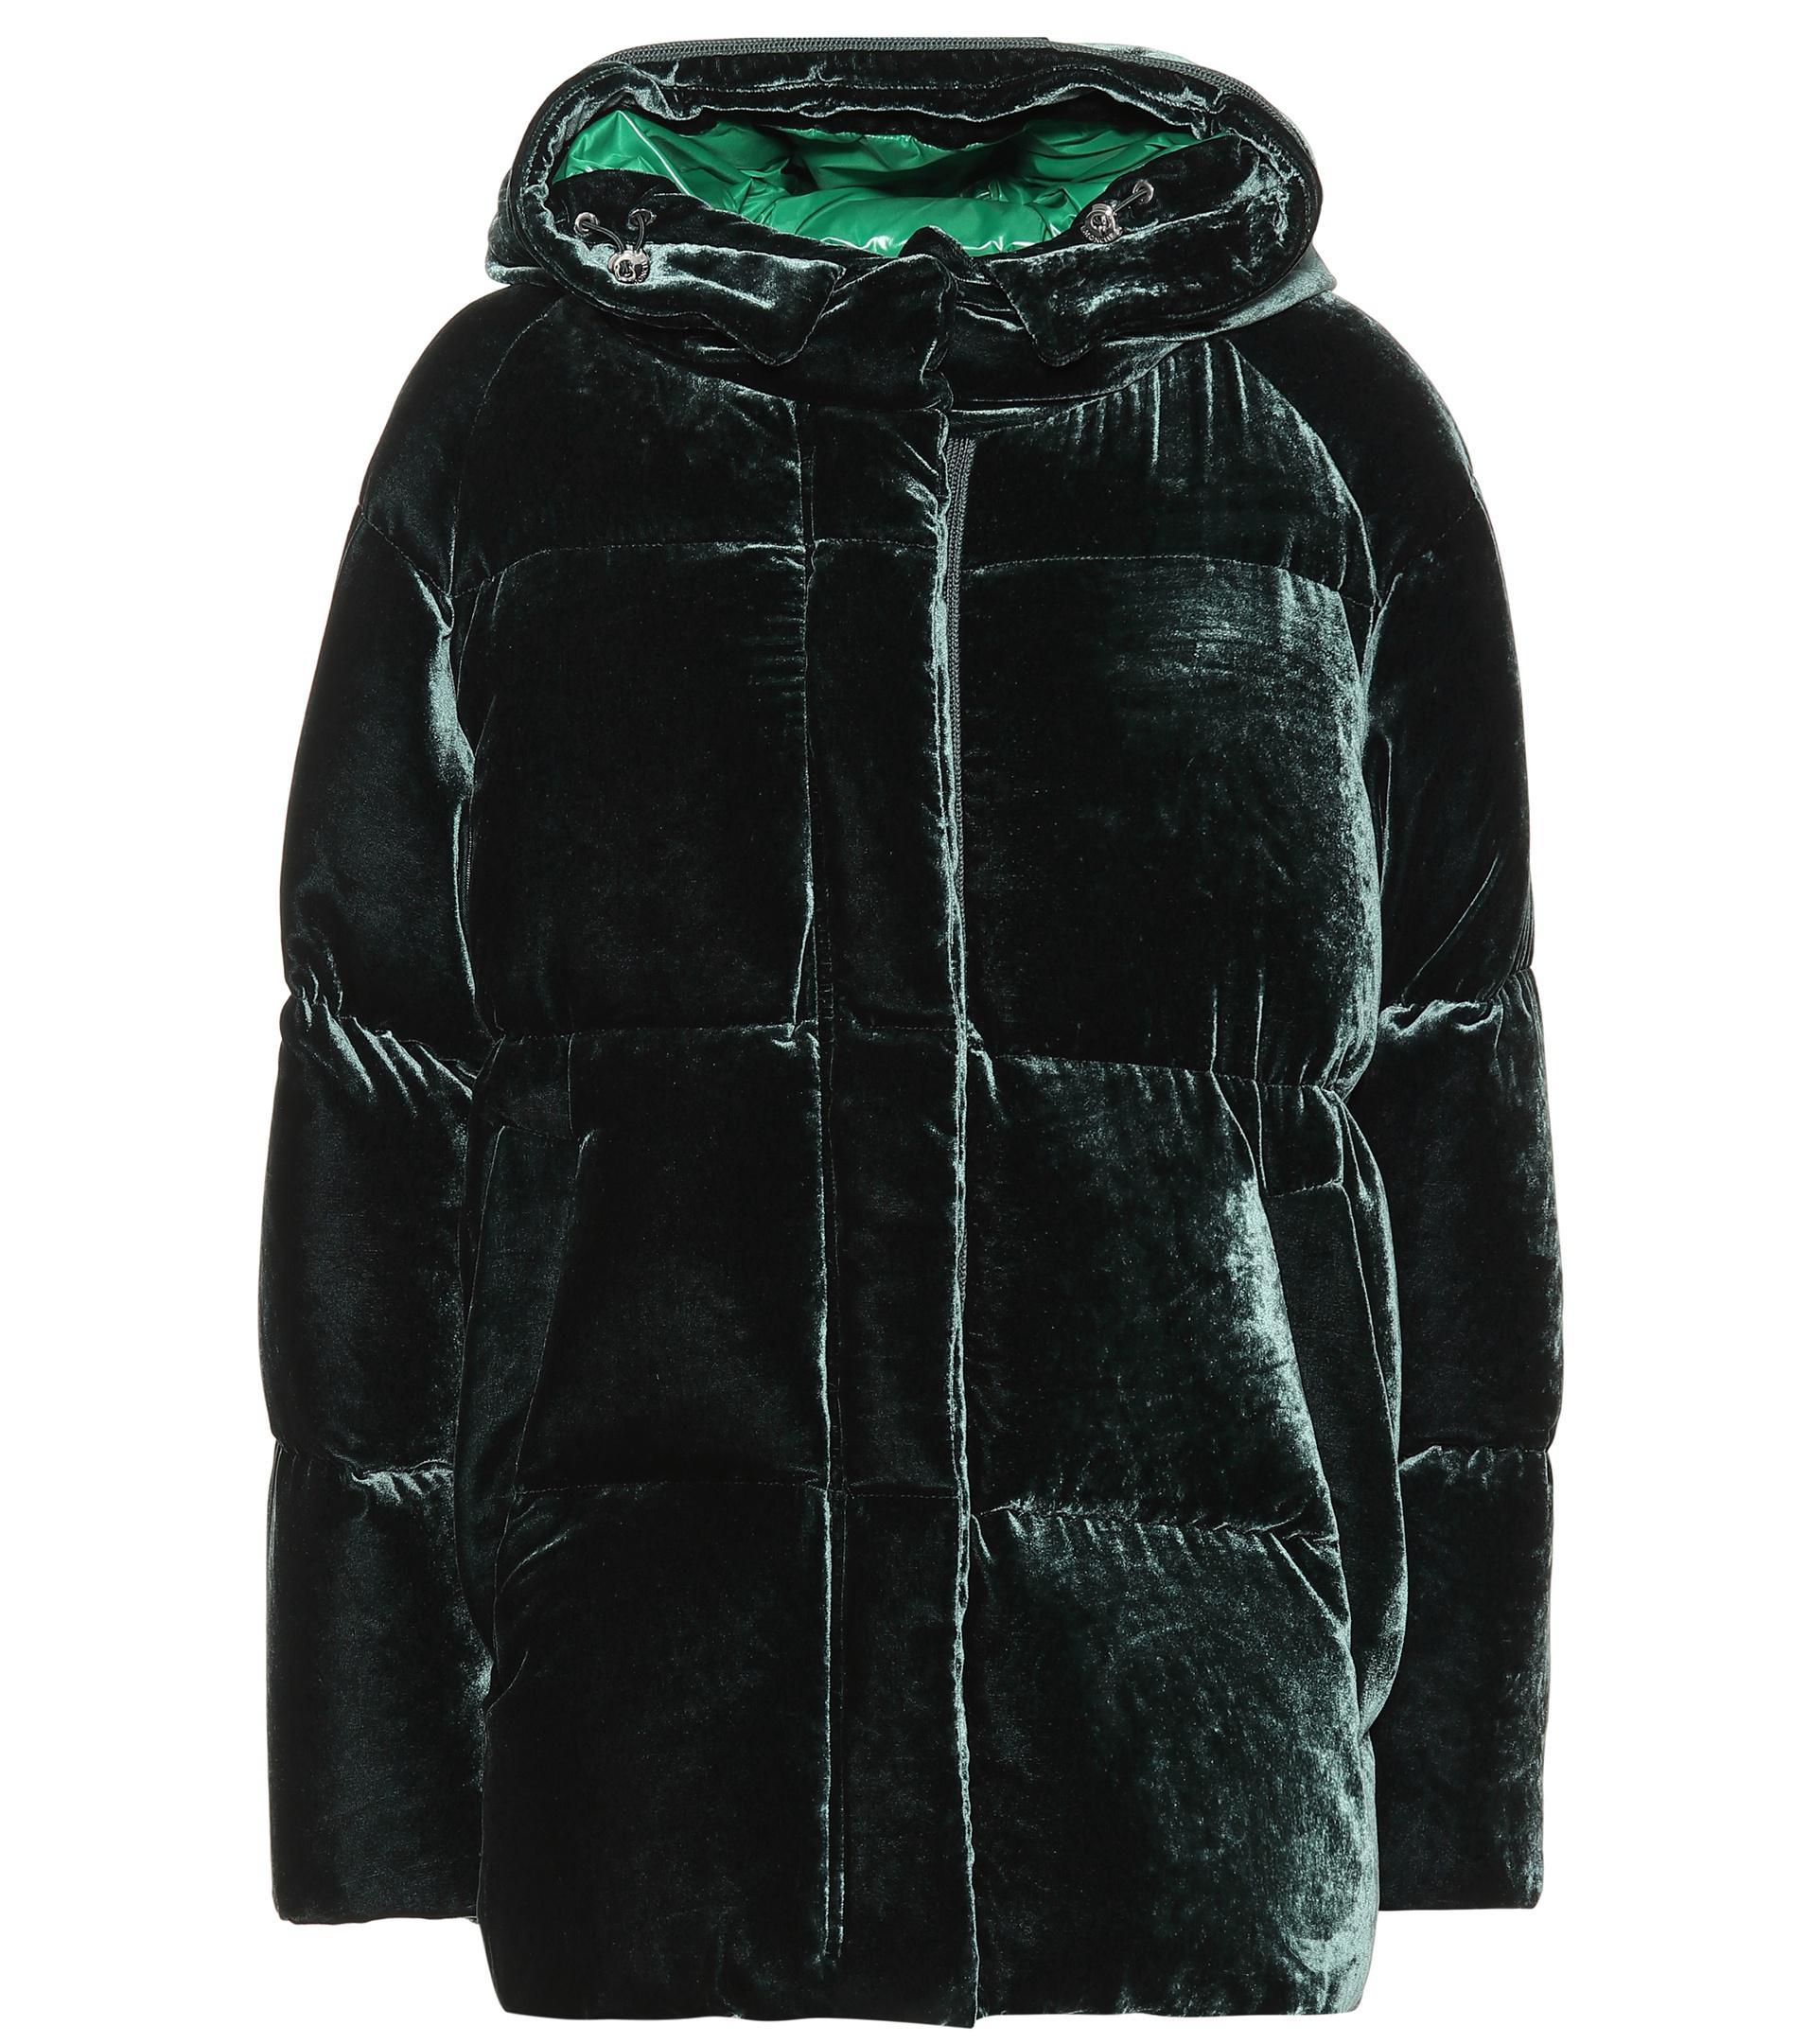 Moncler. Women's Green Quilted Velvet Down Jacket